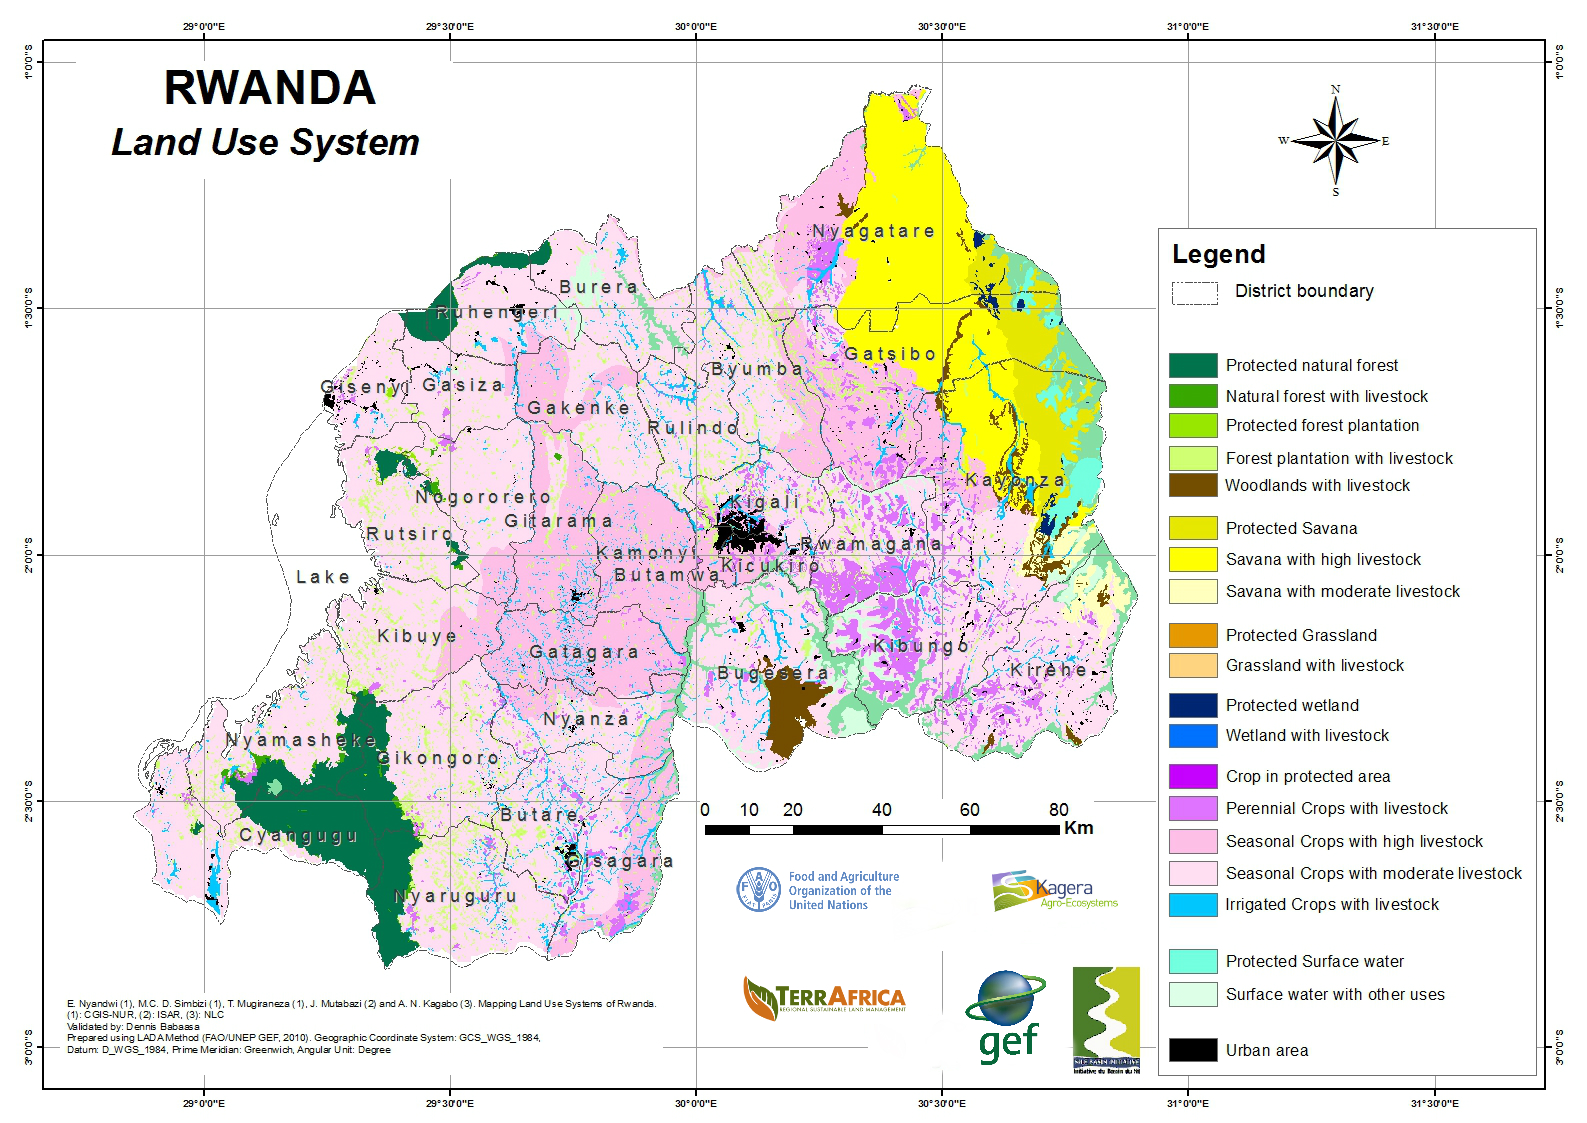 Rwanda Kagera Food And Agriculture Organization Of The United - Rwanda map